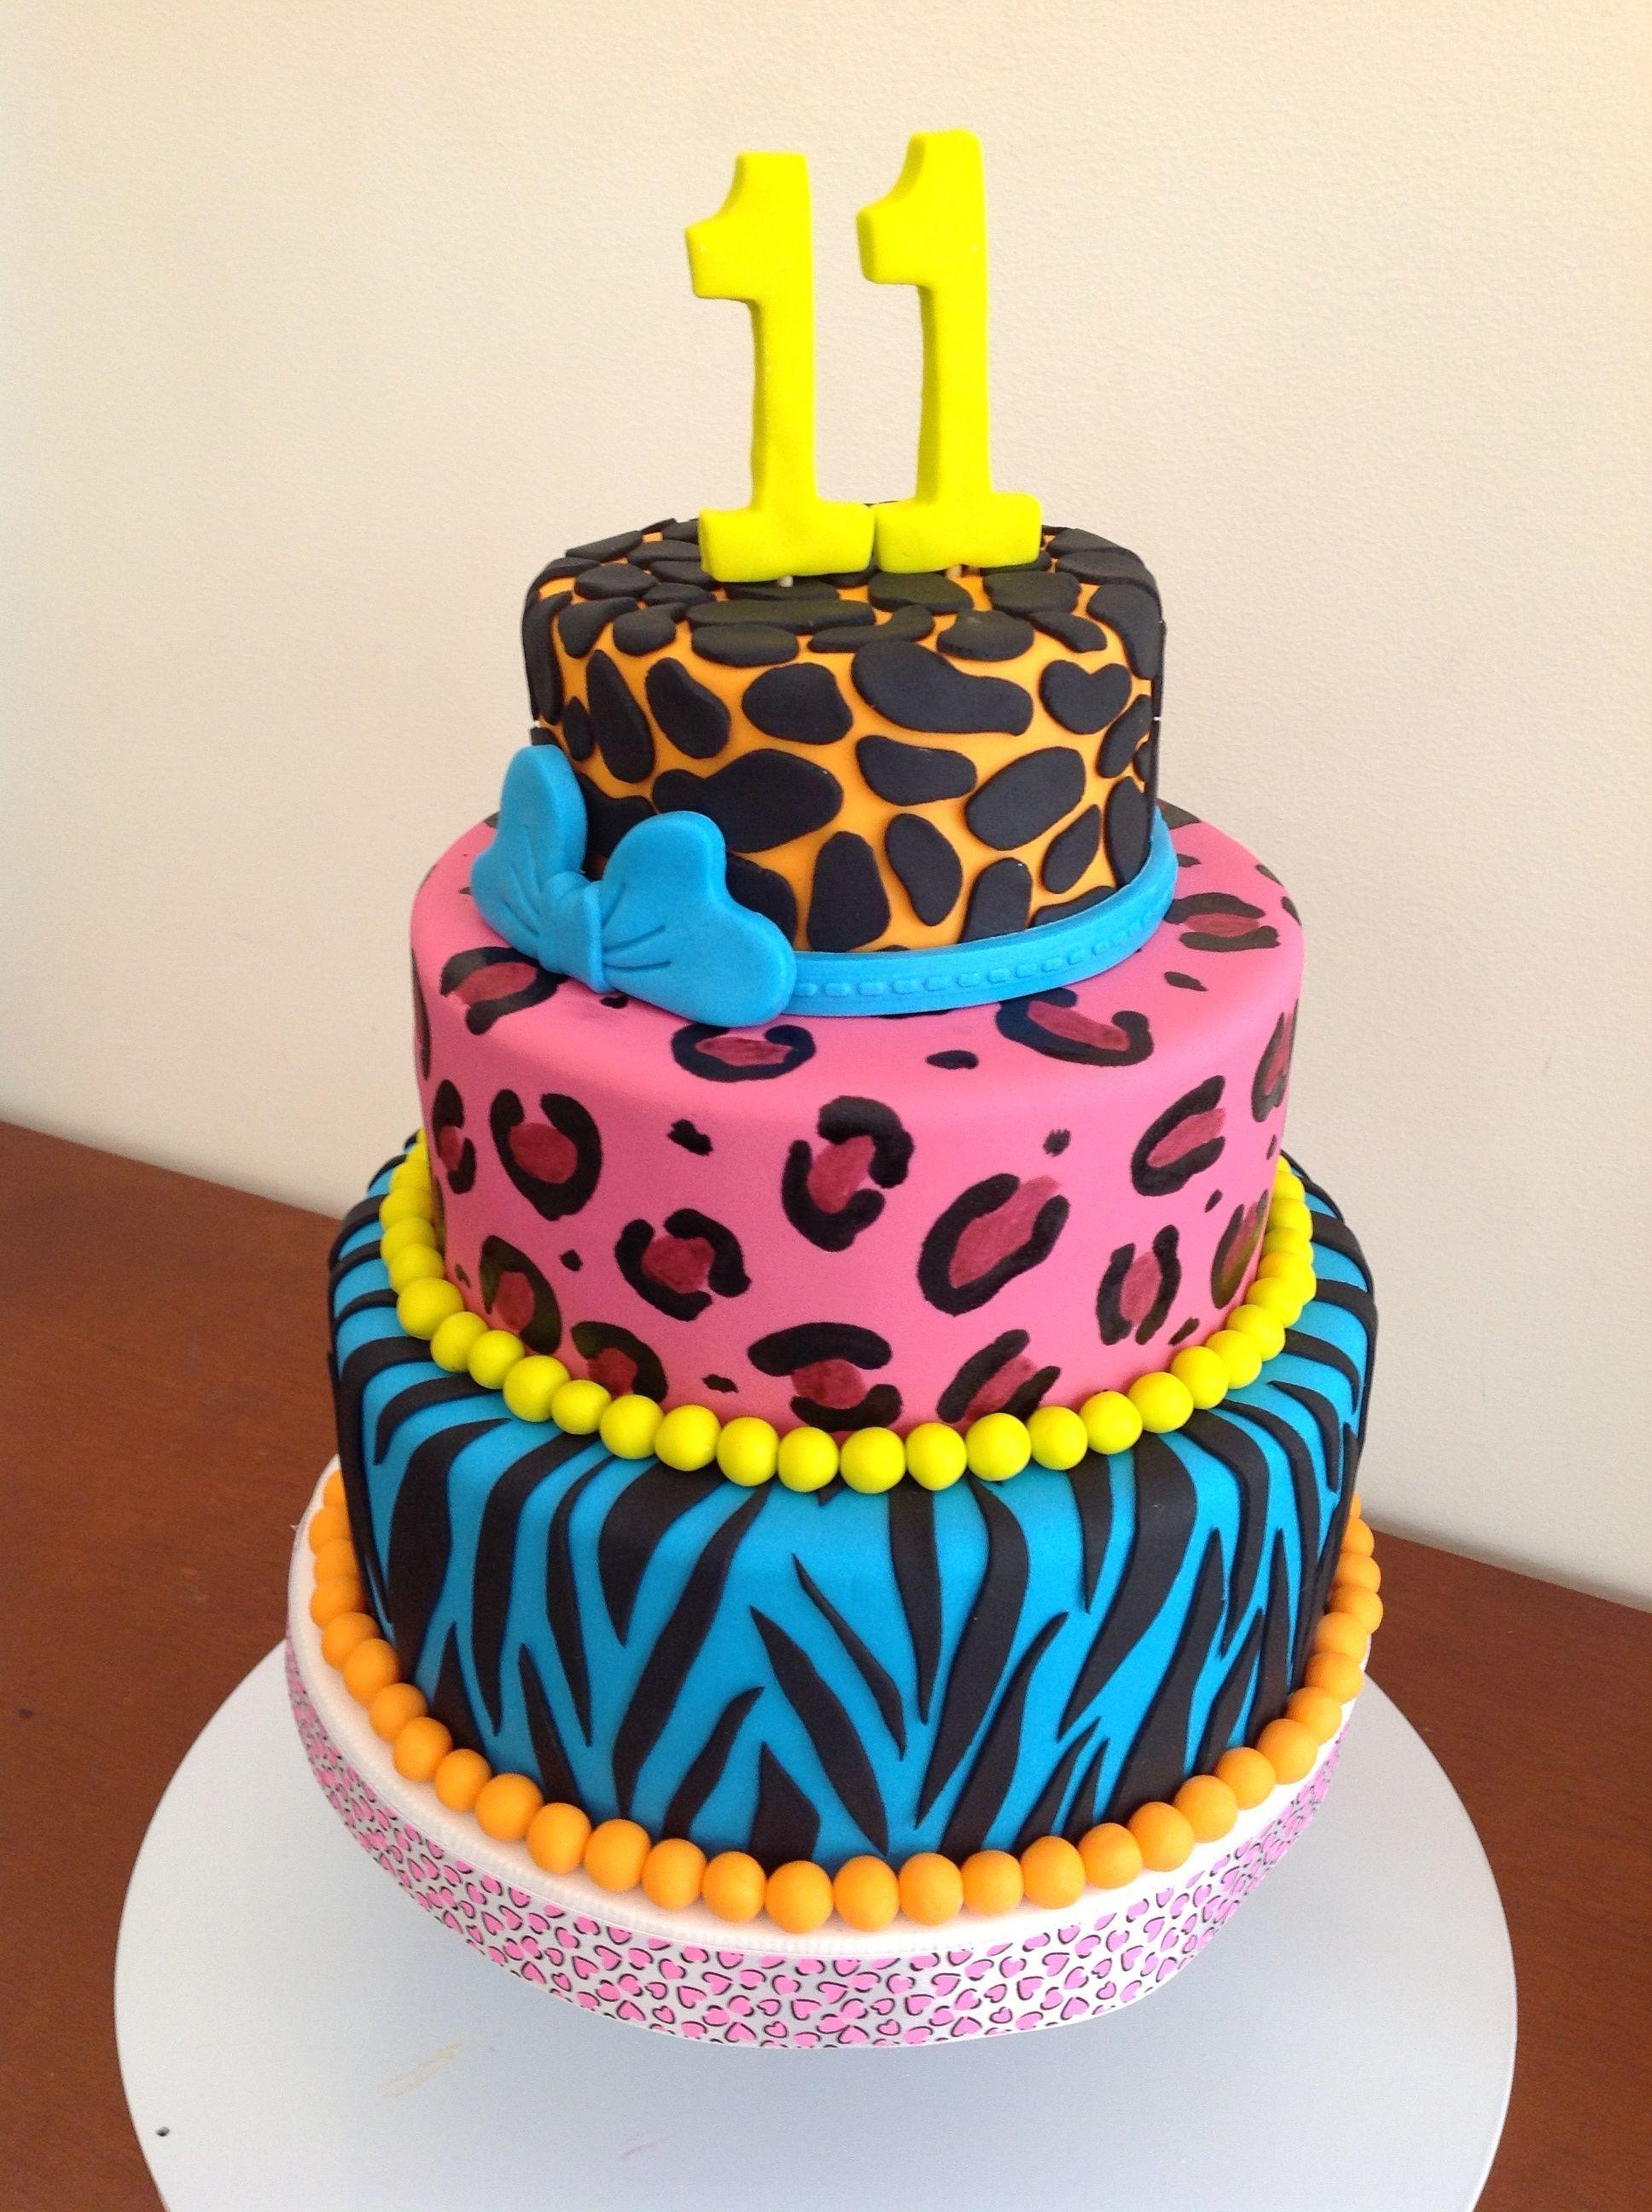 birthday cakes birthday girly cake animal prints cake pastel